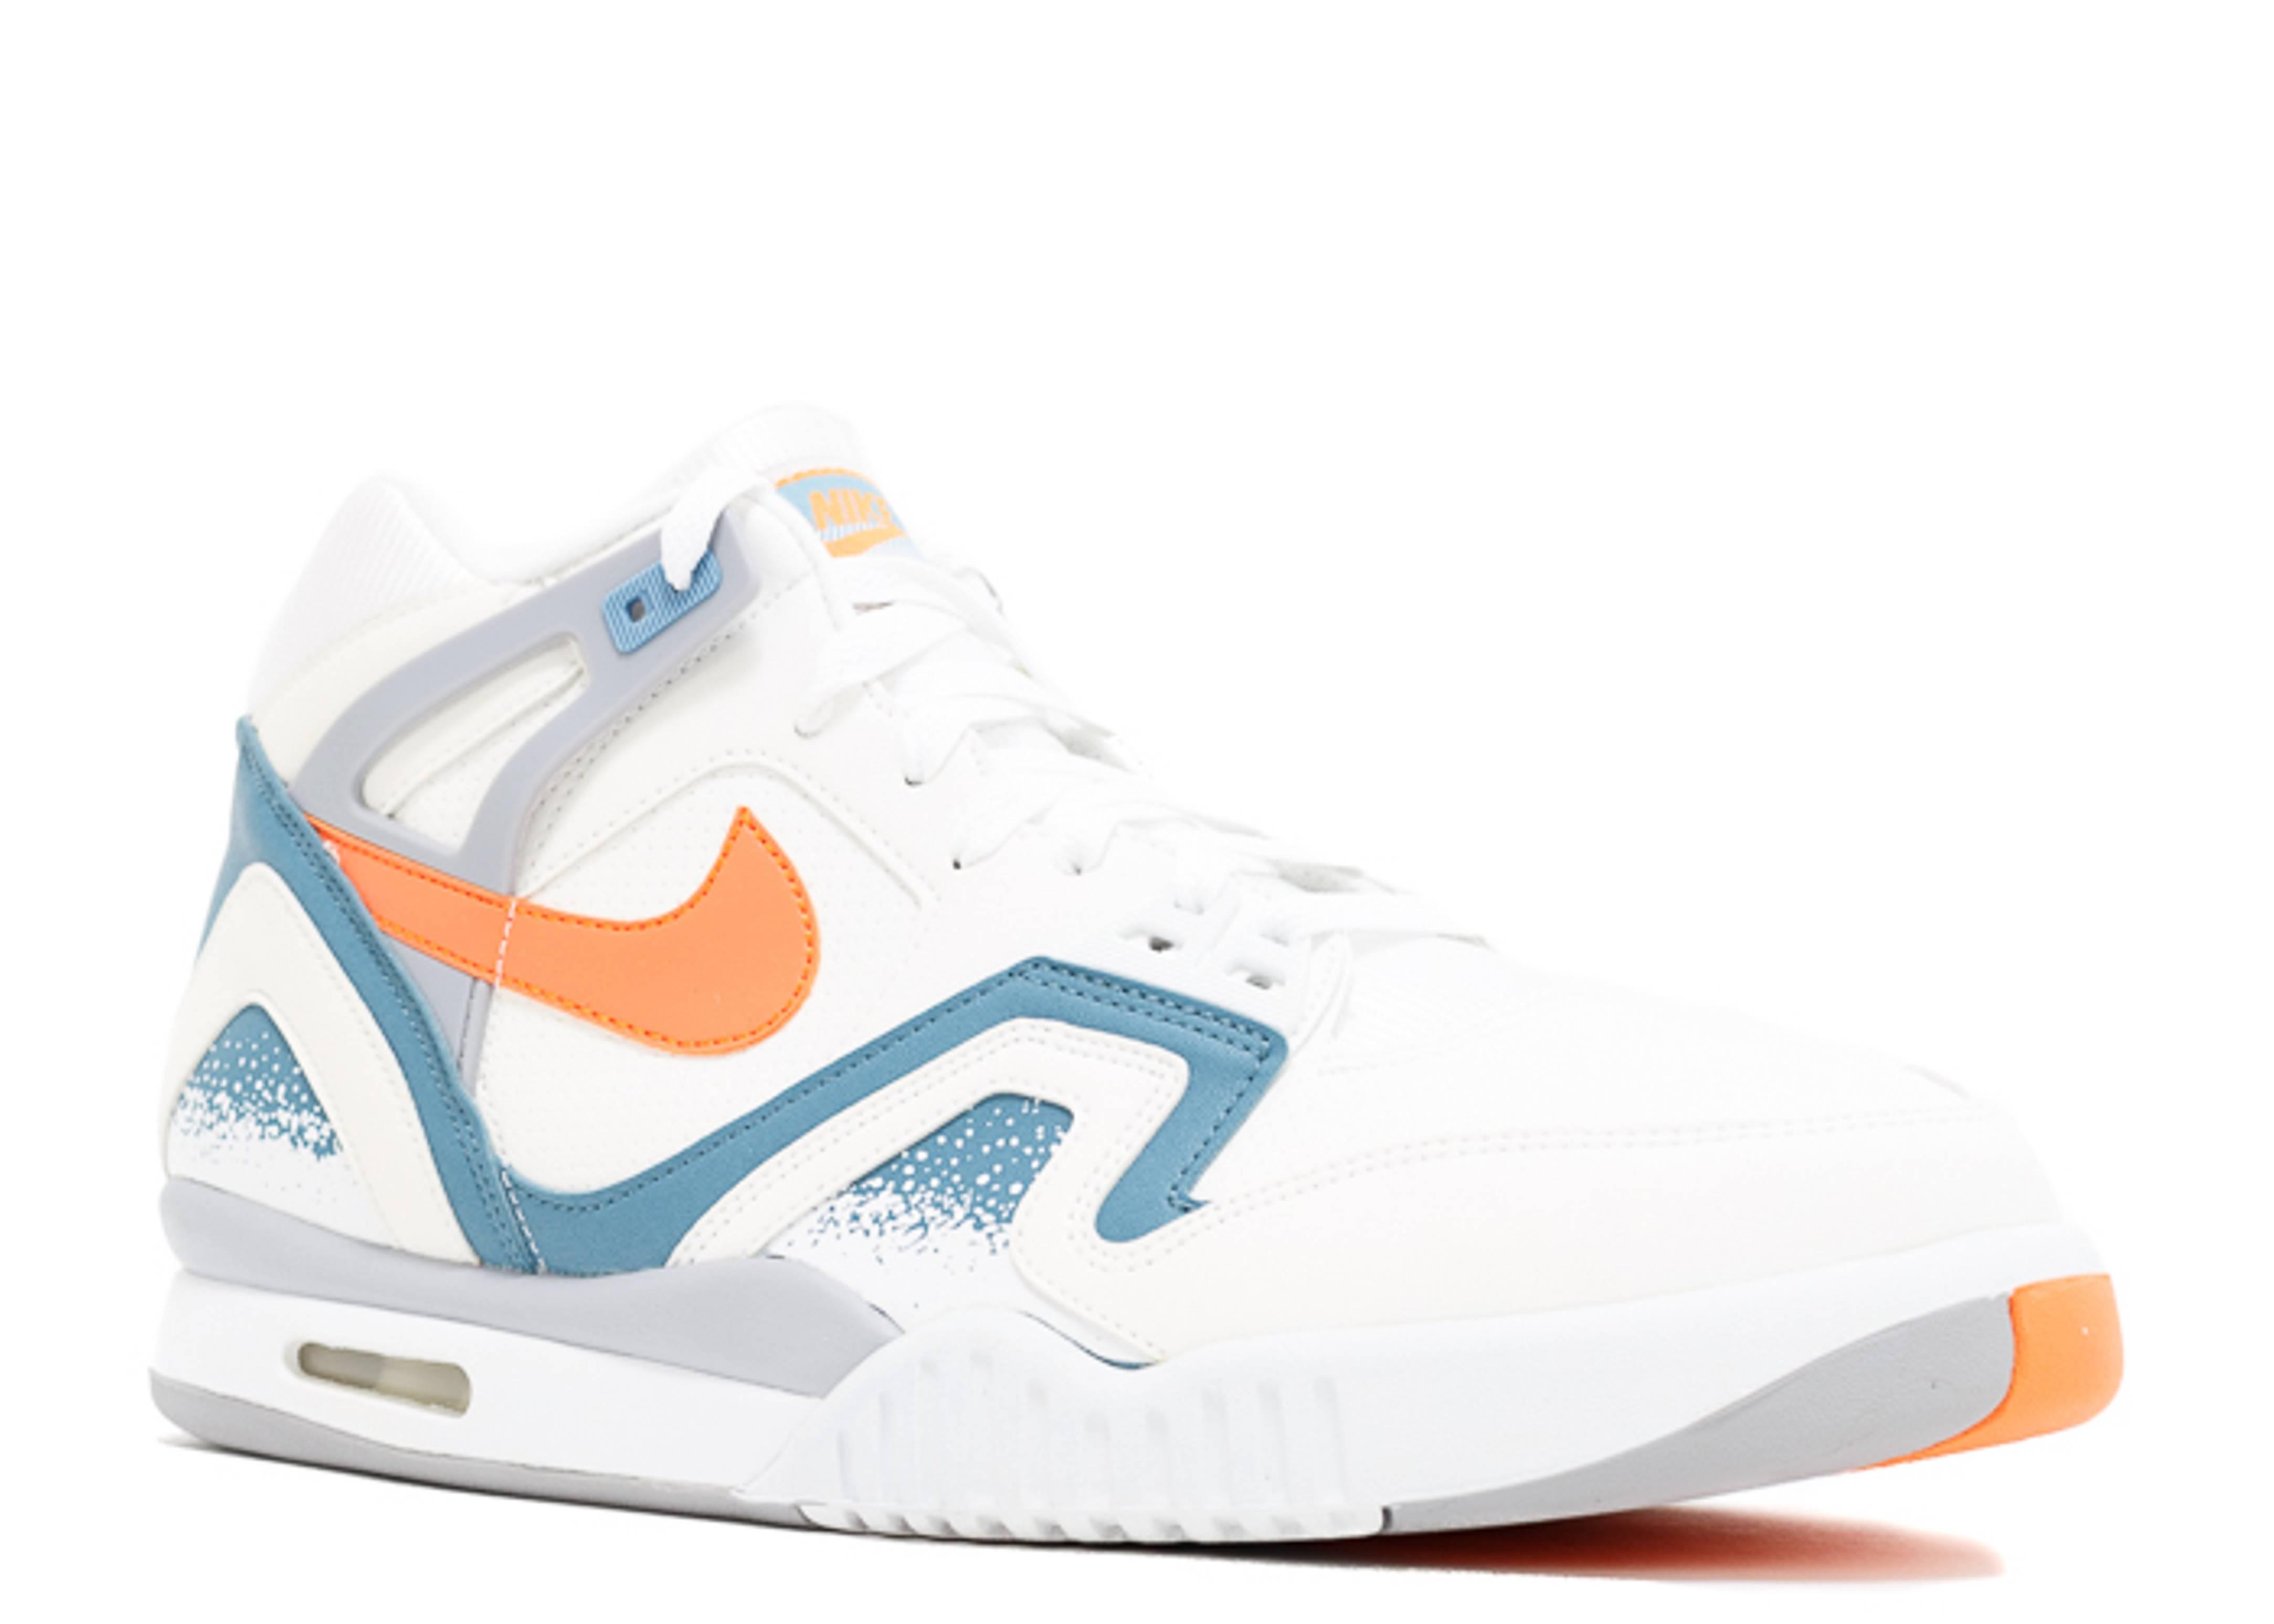 Air Tech Challenge 2 Clay Blue Nike 643089 184 White Orange Burst Clay Blue Flat Silver Flight Club